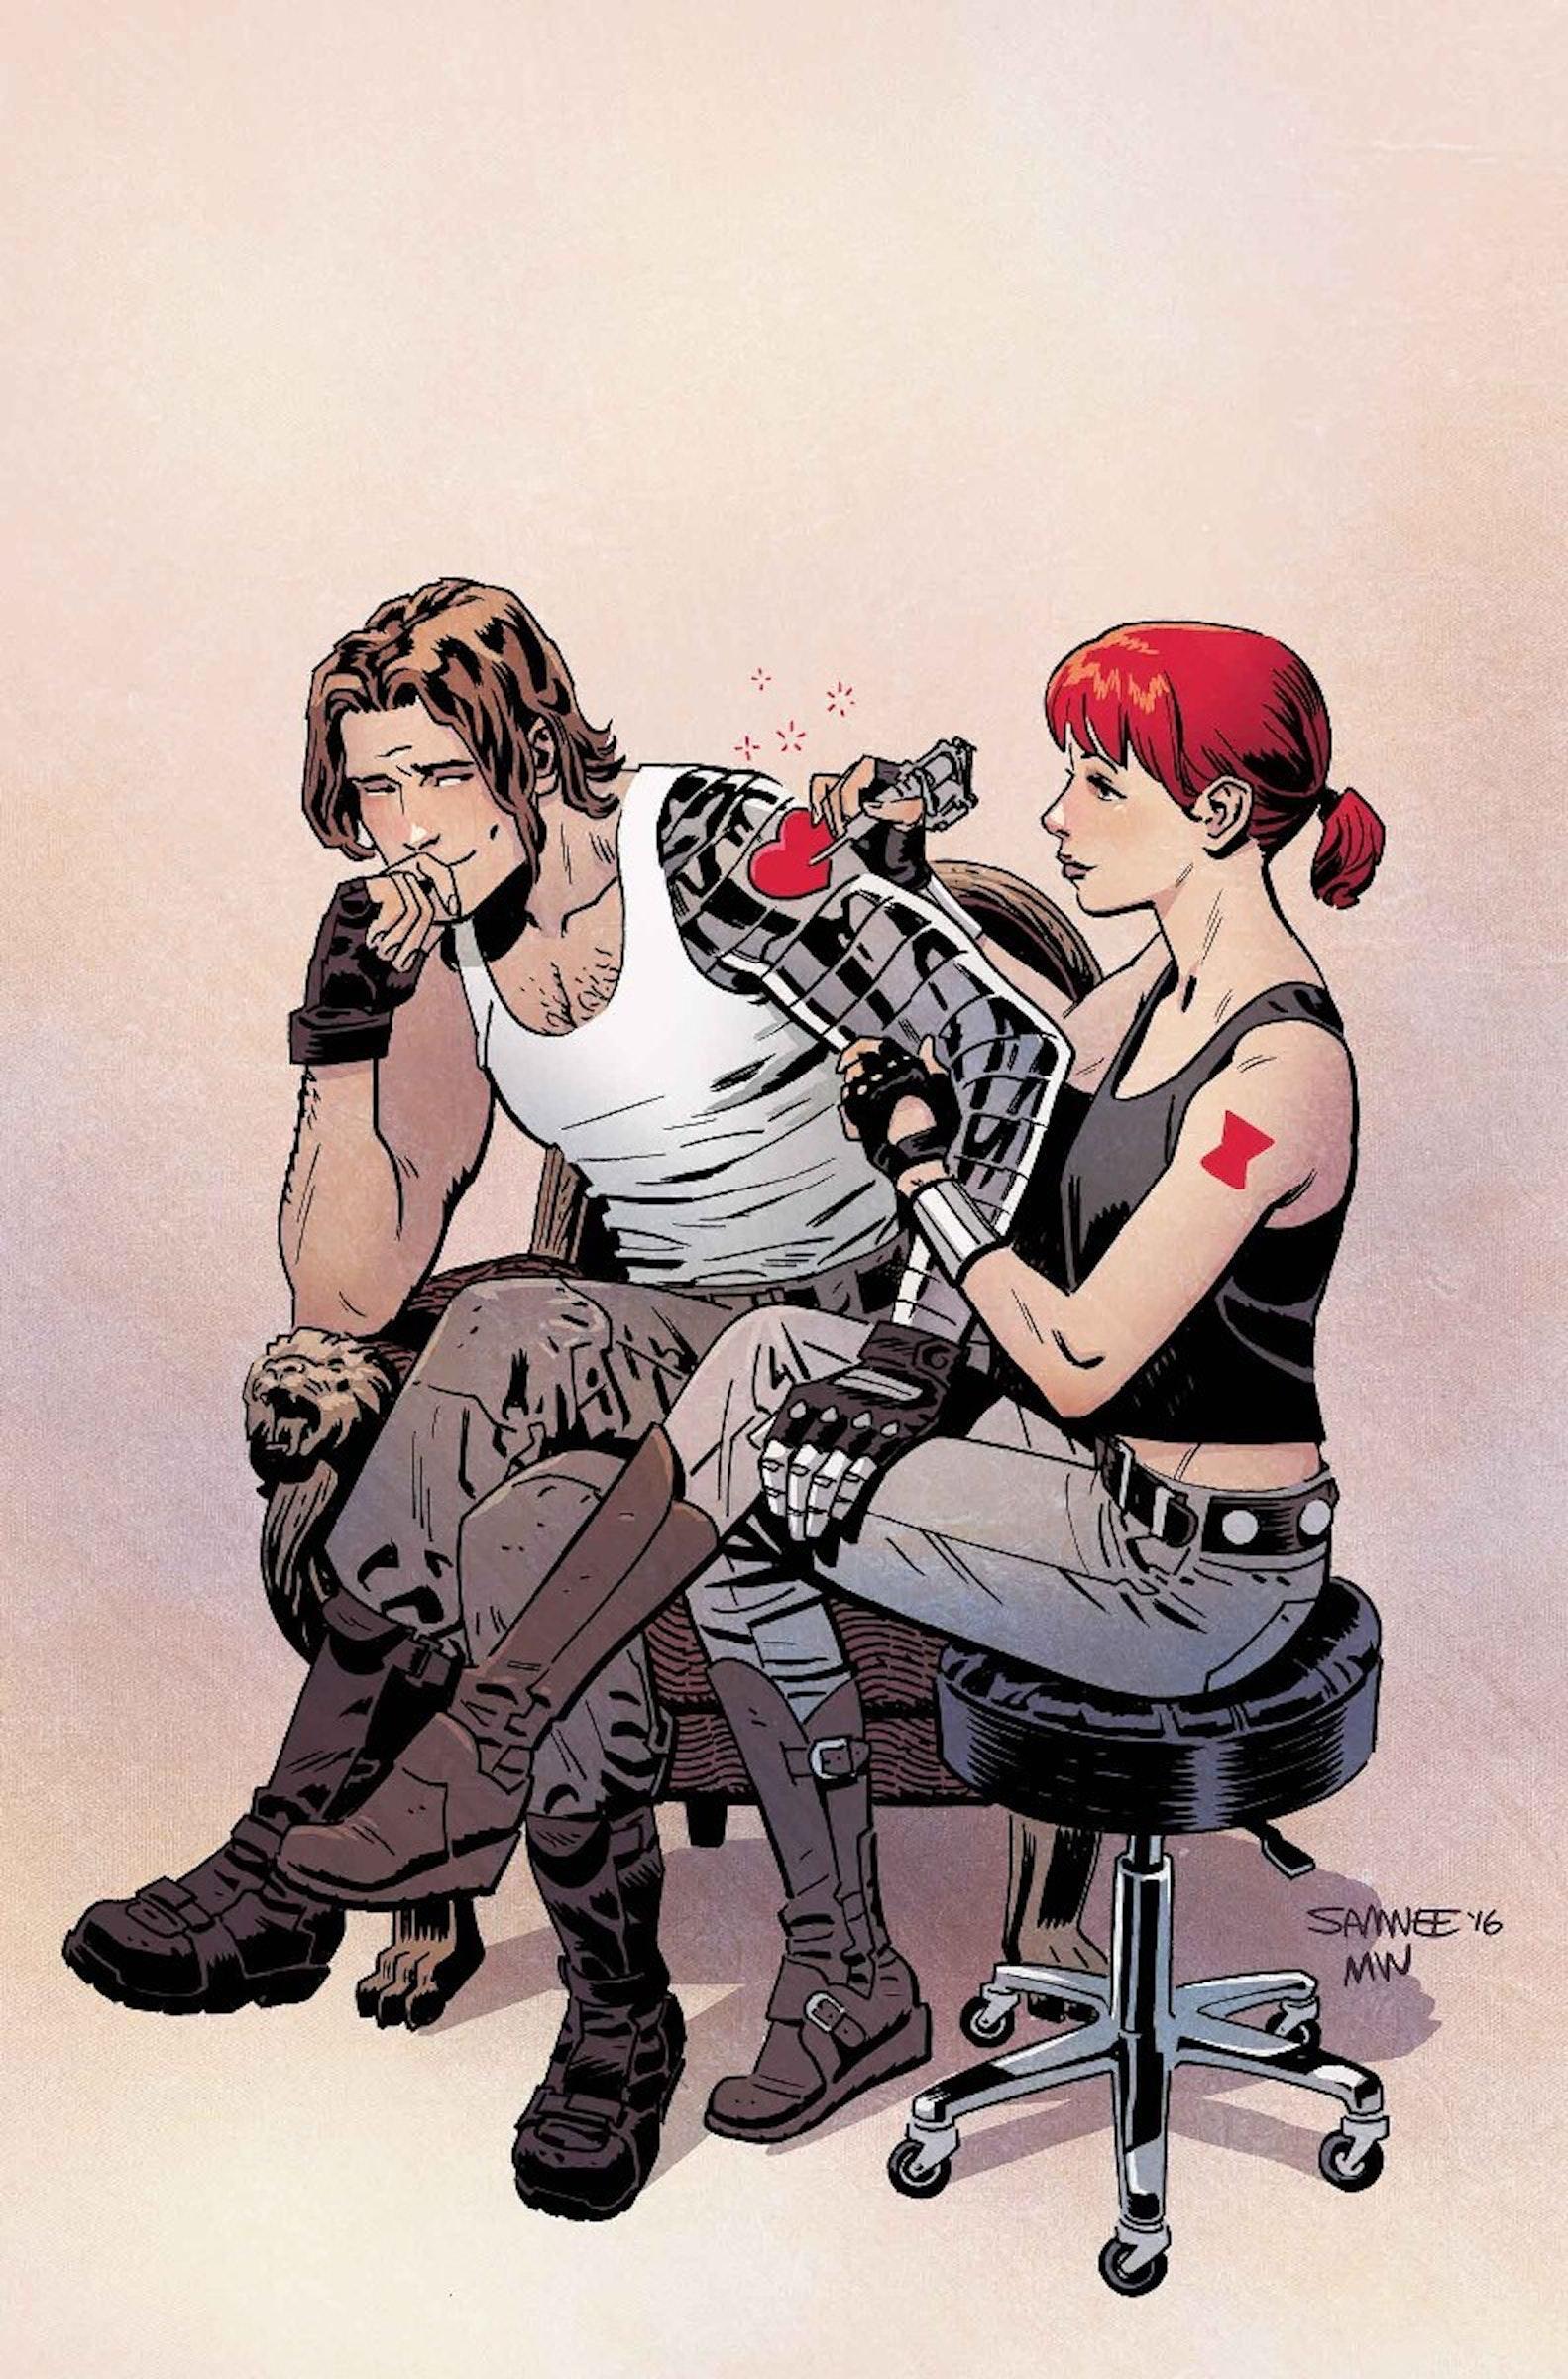 Nat and Bucky sitting in a tree, t.a.t.t.o.o.i.n.g.